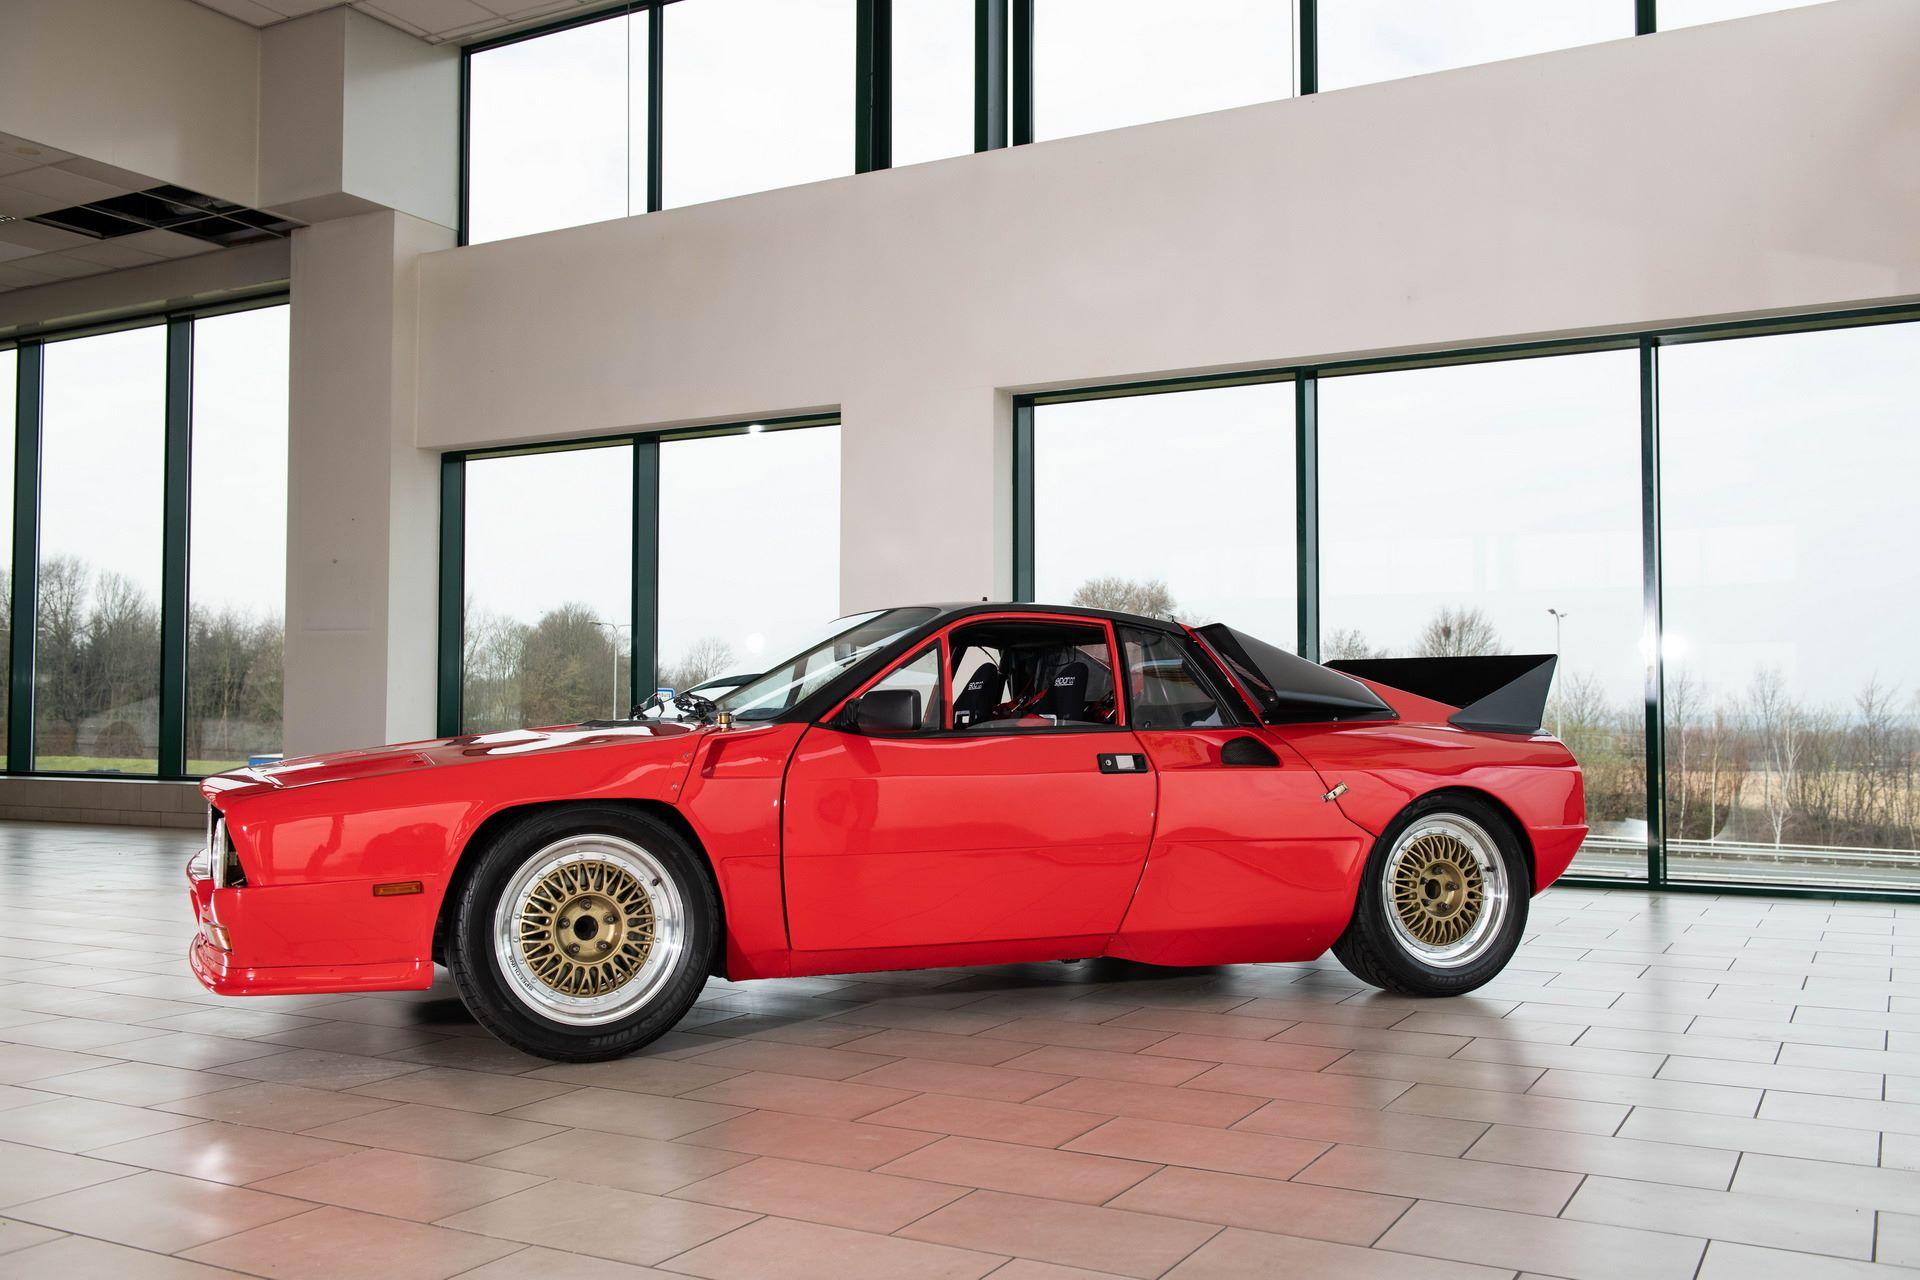 Lancia-037-Prototype-52